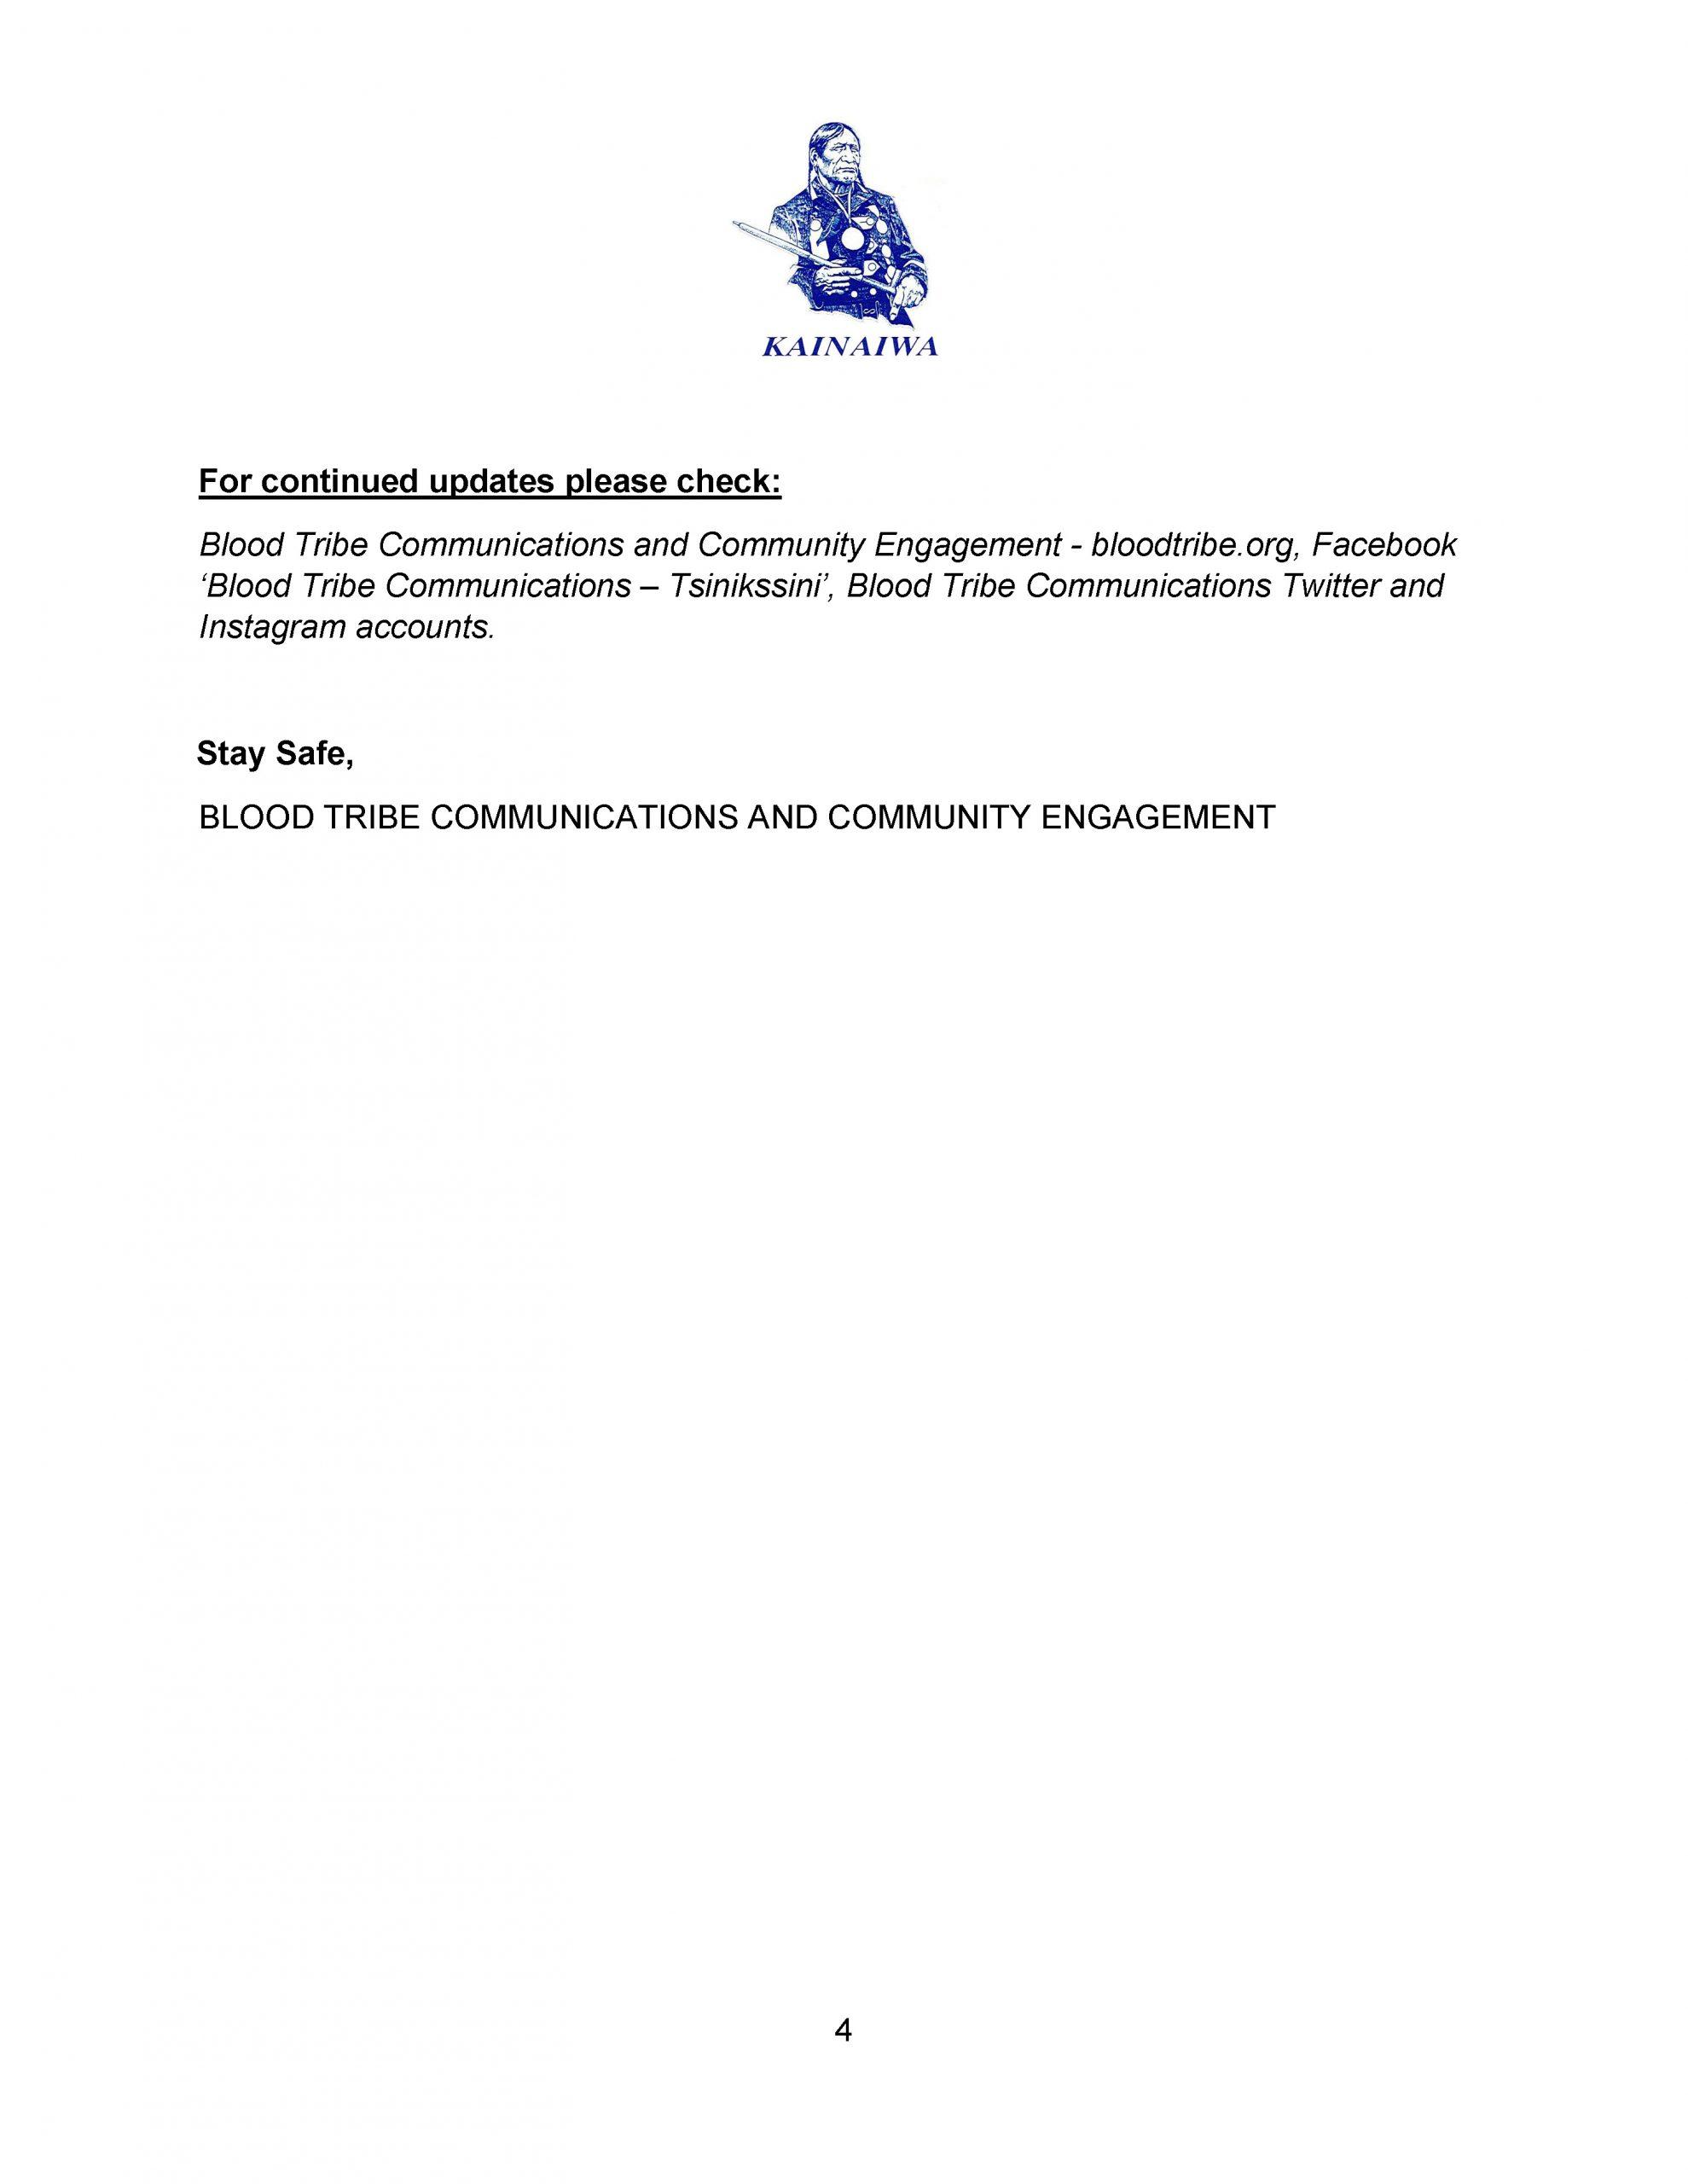 Blood Tribe COVID-19 Response Bulletin – (April 9, 2021) - Page 4